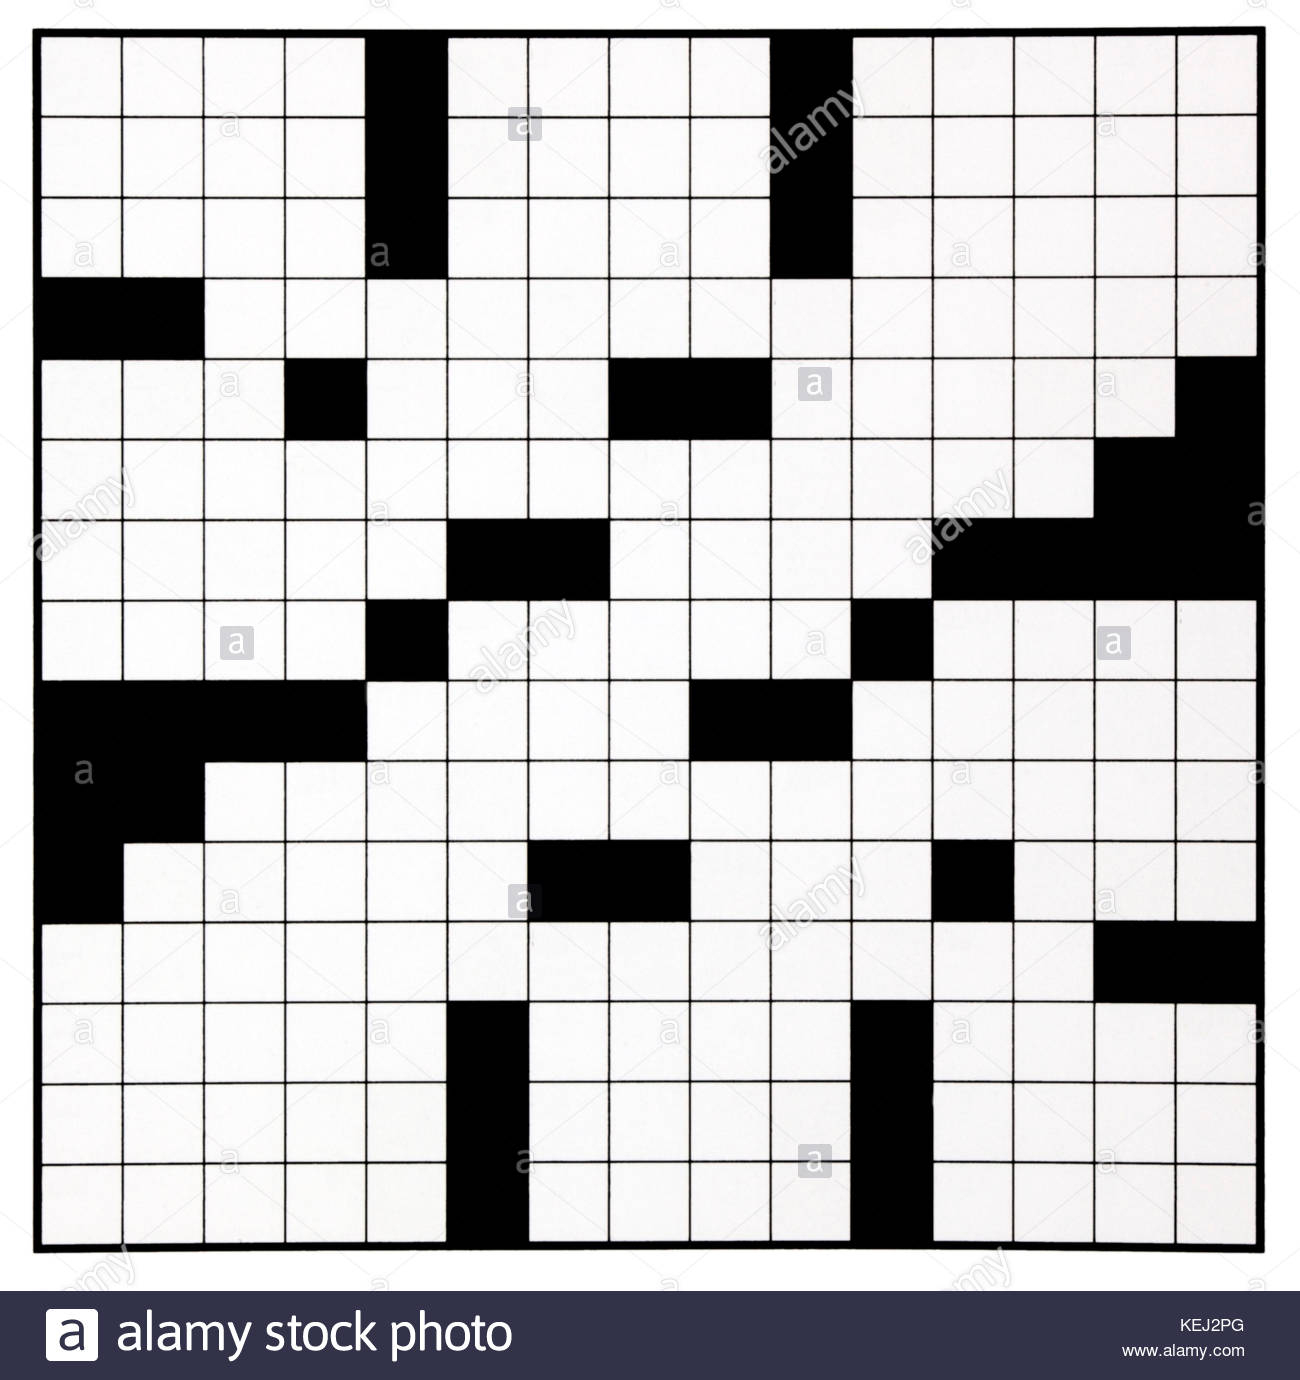 Blank Crossword Grid - Yapis.sticken.co - Printable Blank Crossword Puzzle Grid